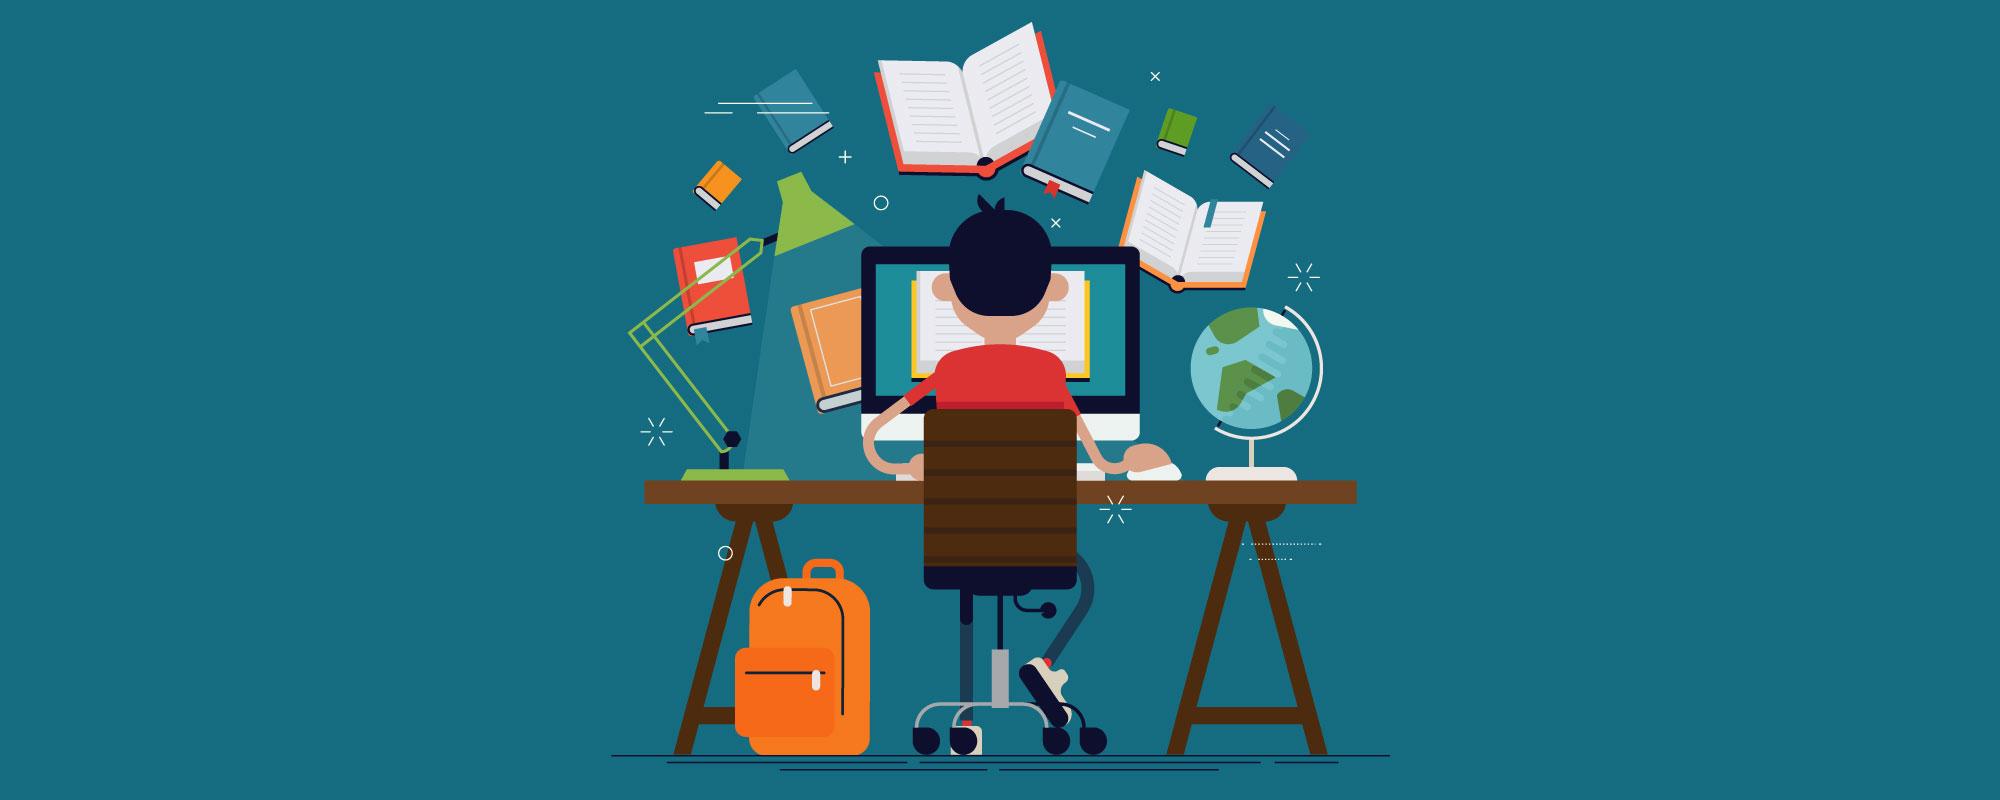 desventajas de estudiar en línea